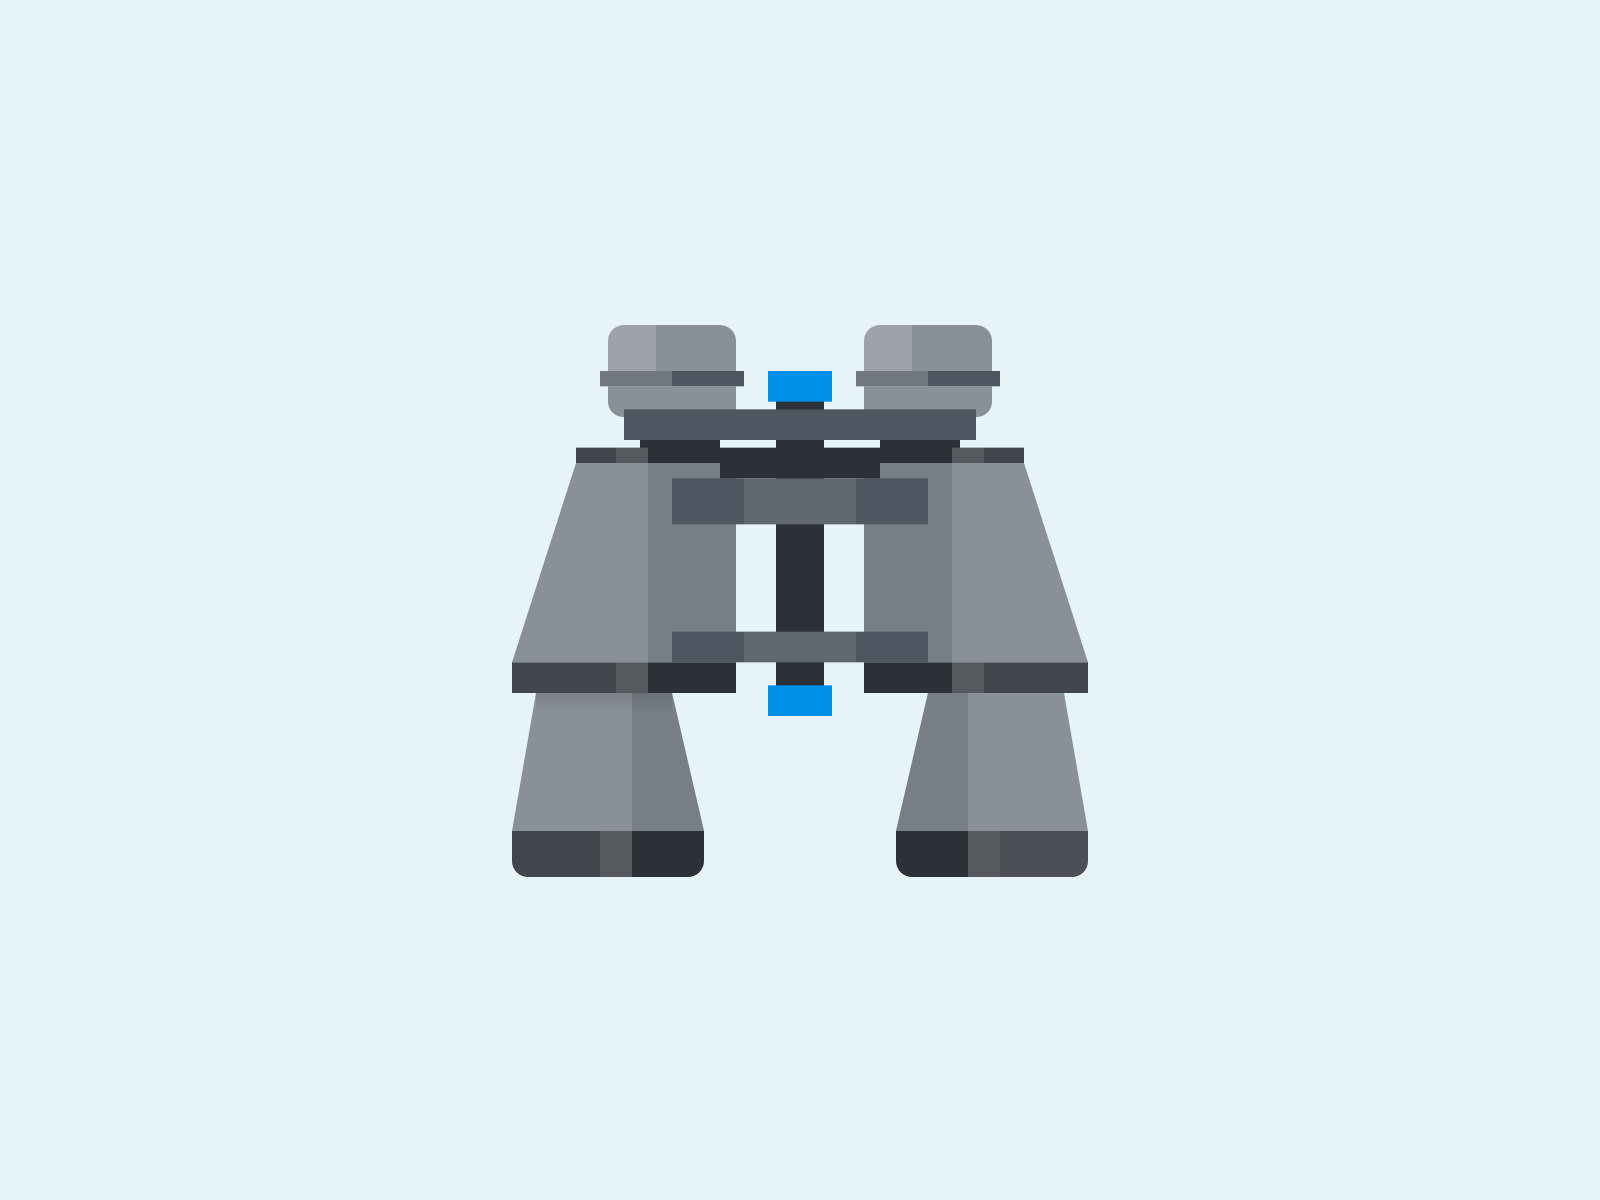 Binoculars Icon find search binoculars illustration jenks icon